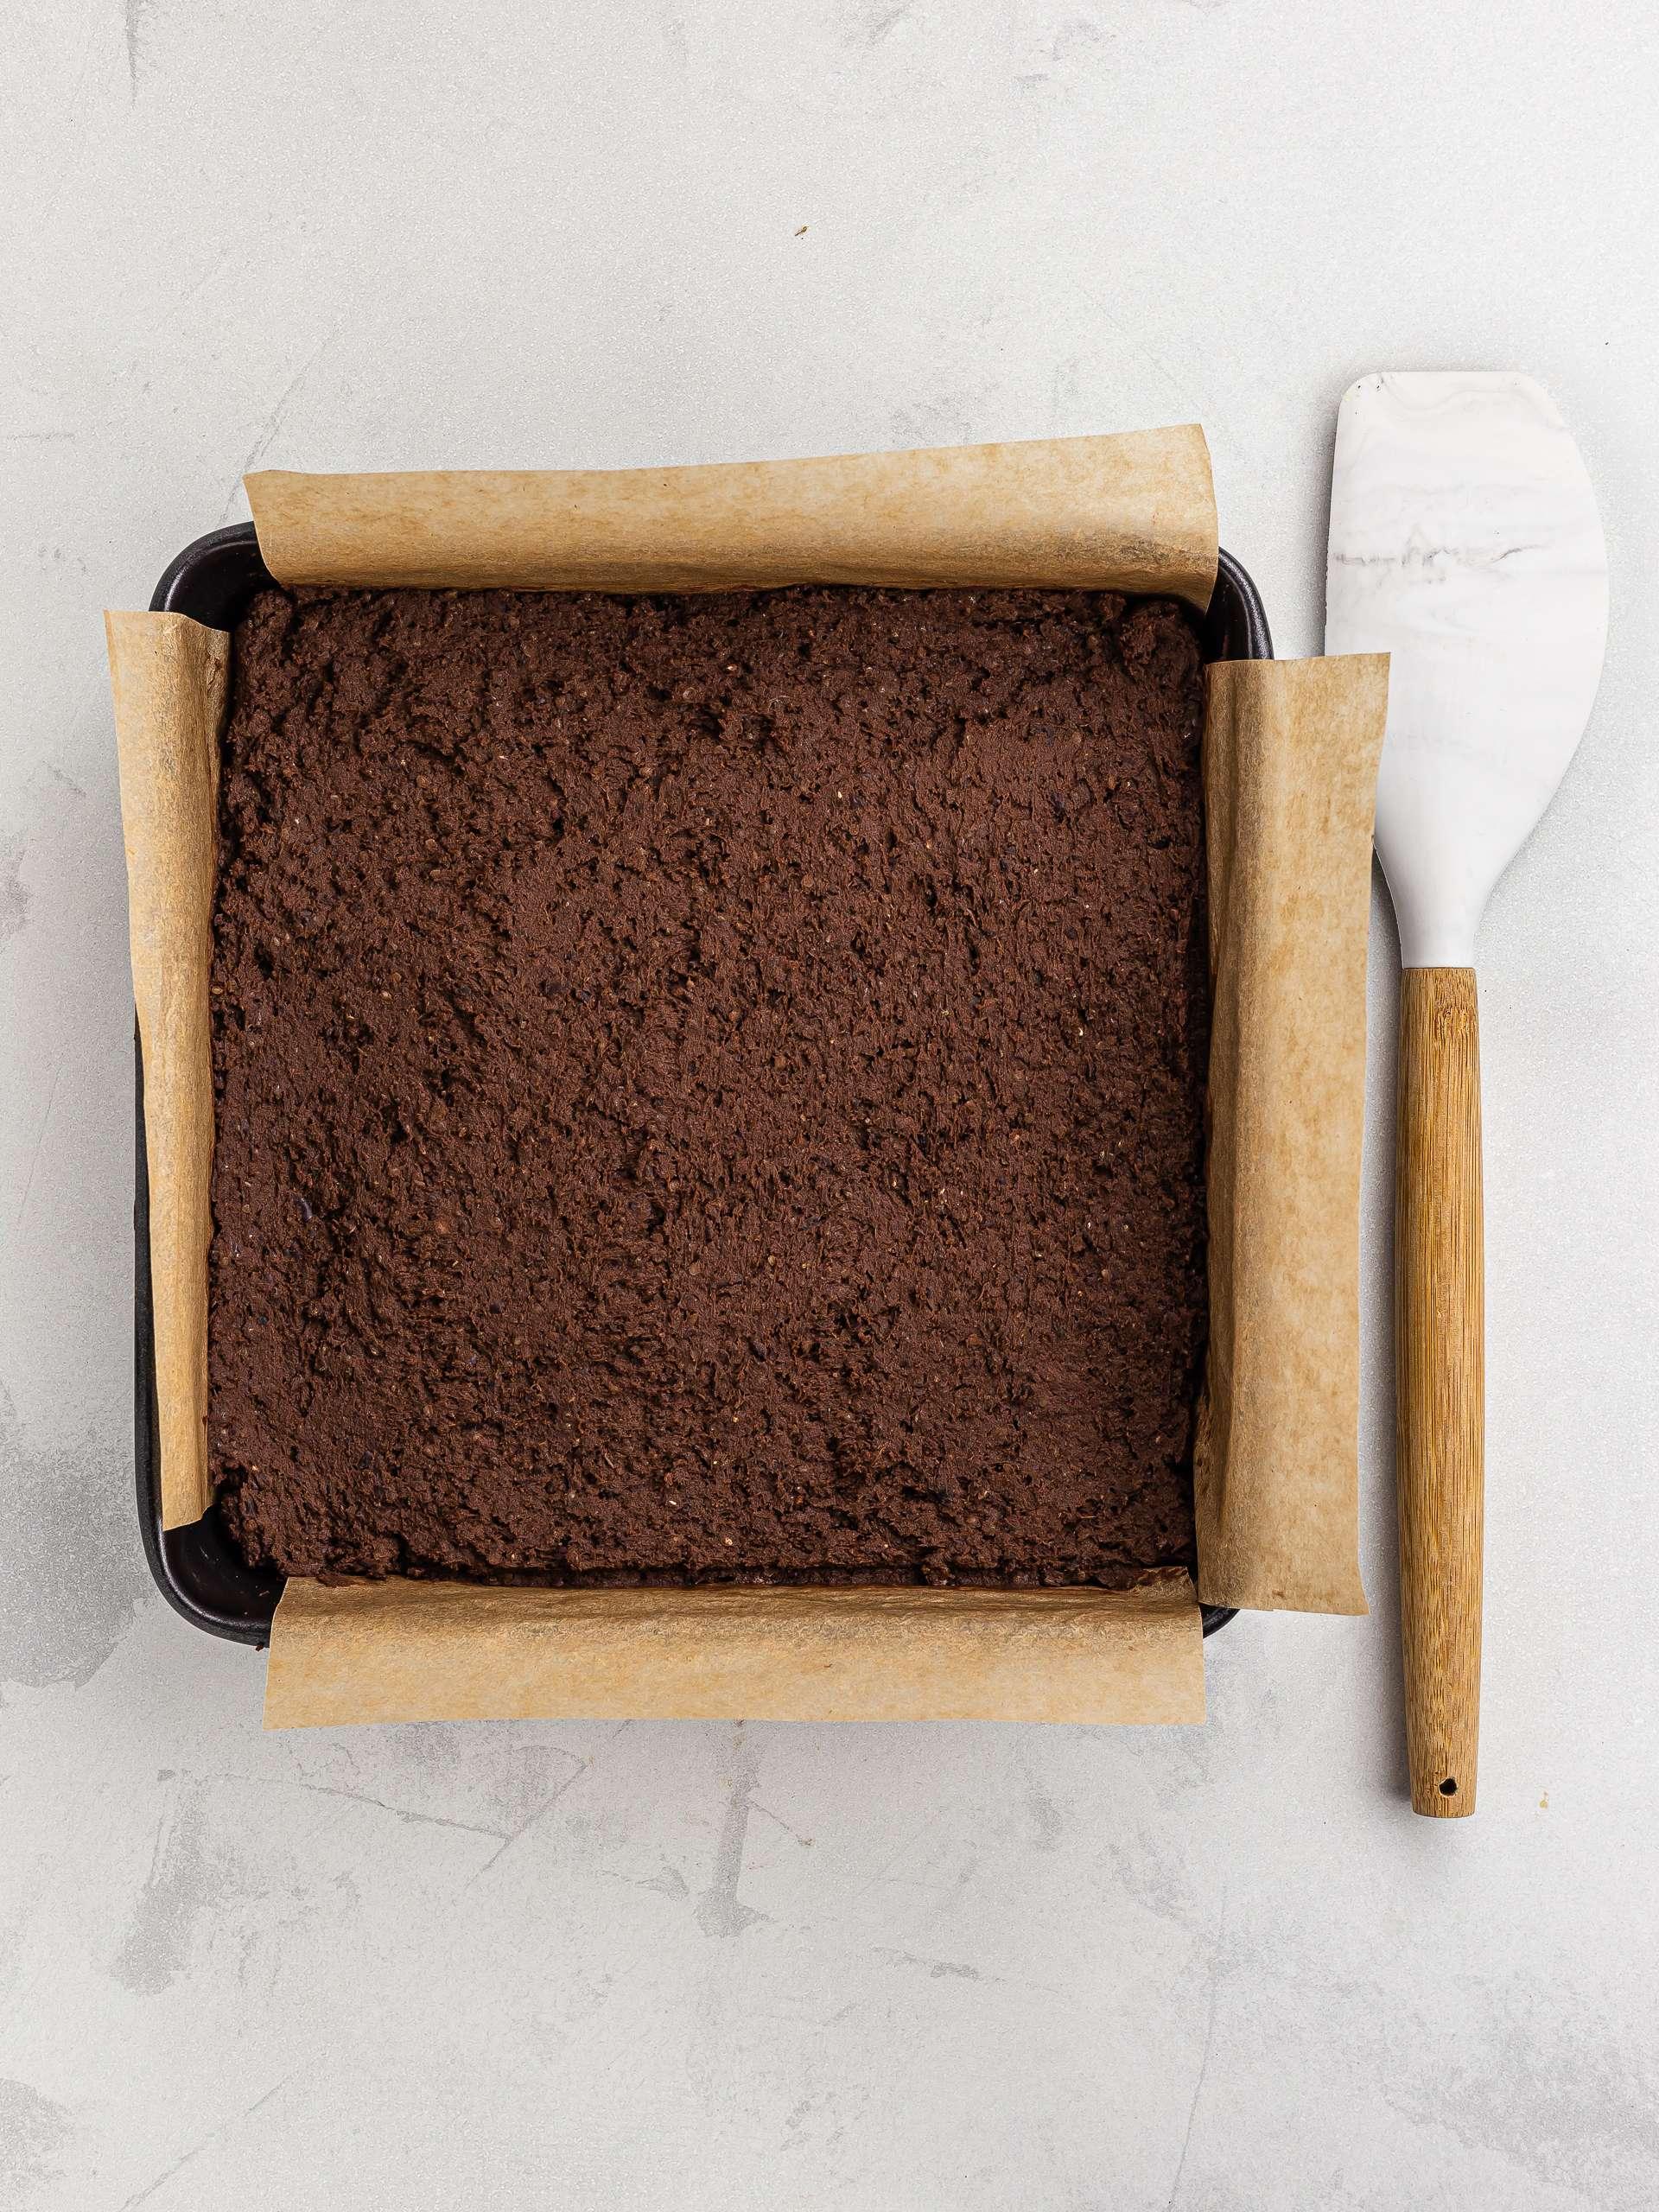 hemp seed brownie dough in a baking tin